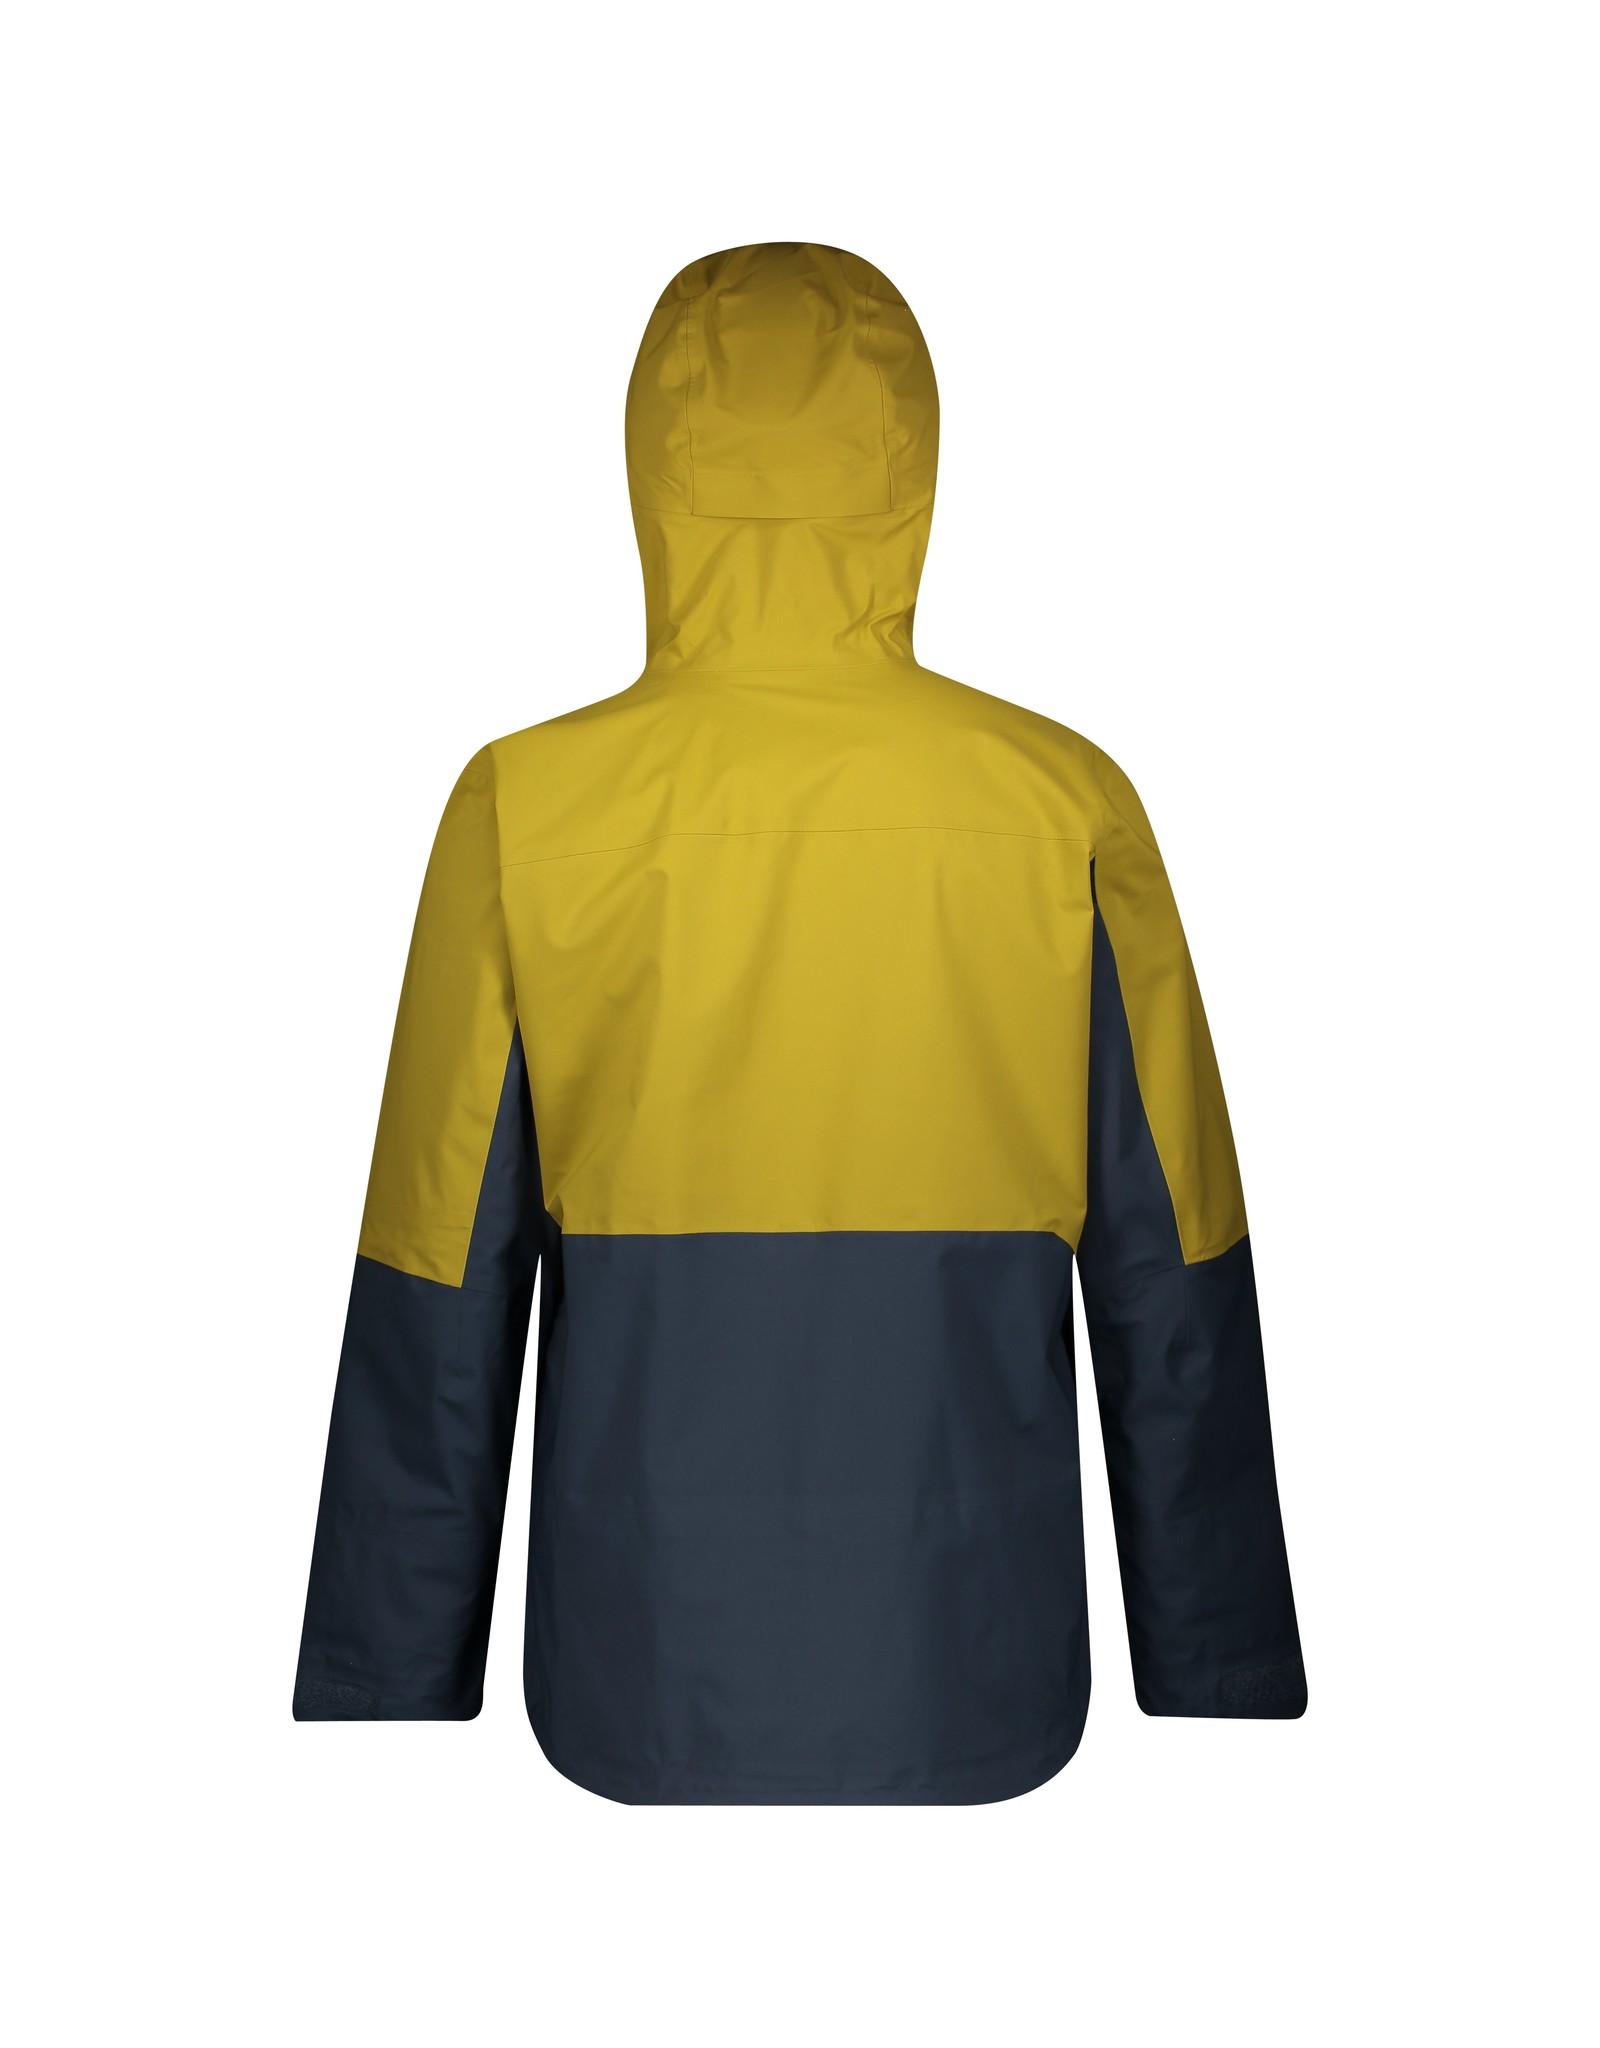 Scott VERTIC 3L Jacket 2021/22